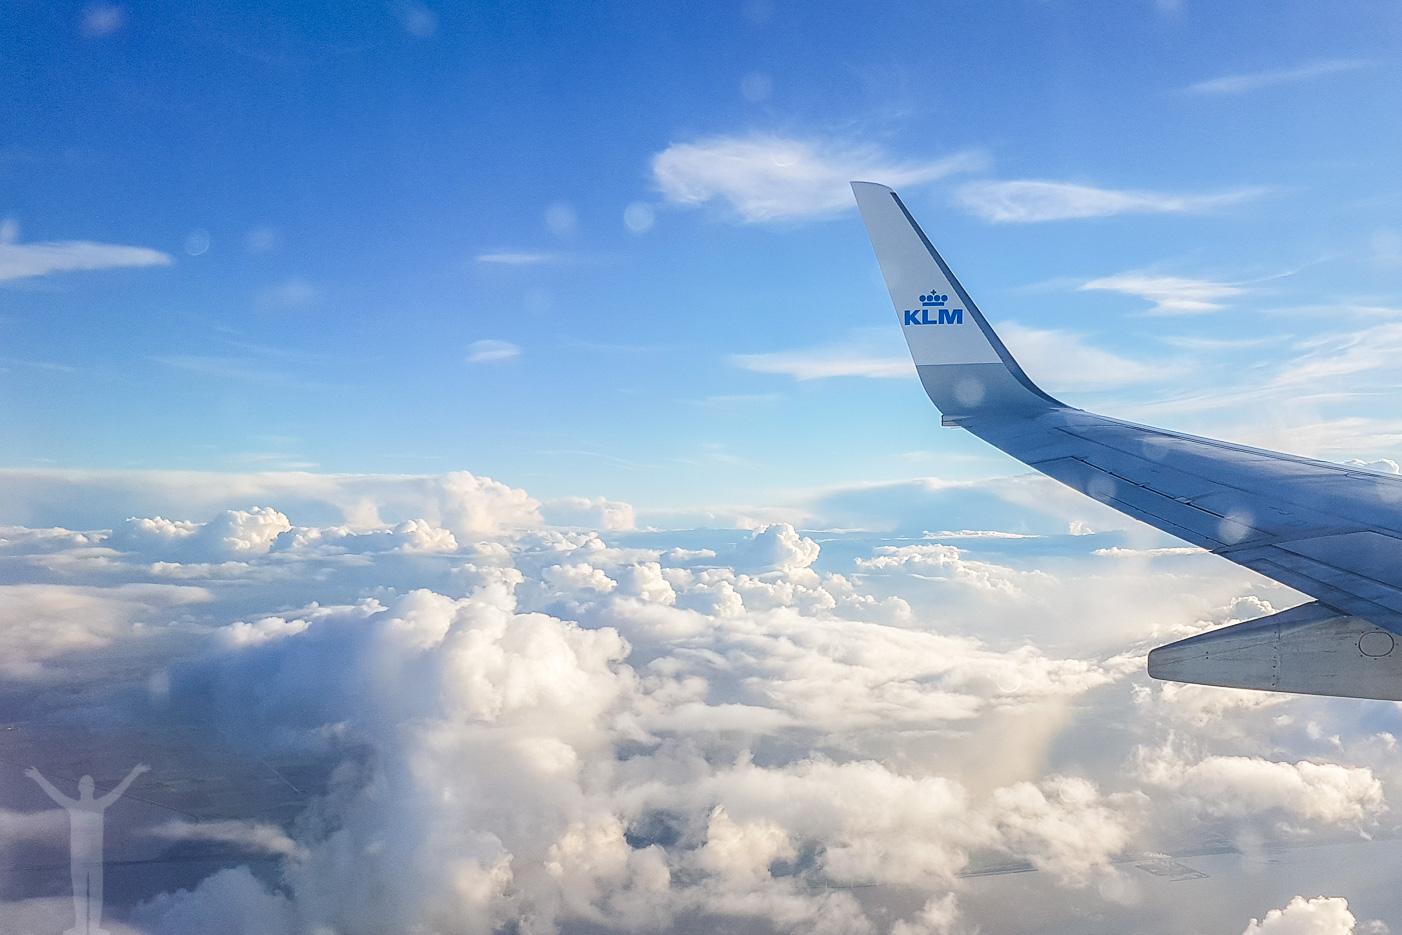 KLM Boeing 737-900